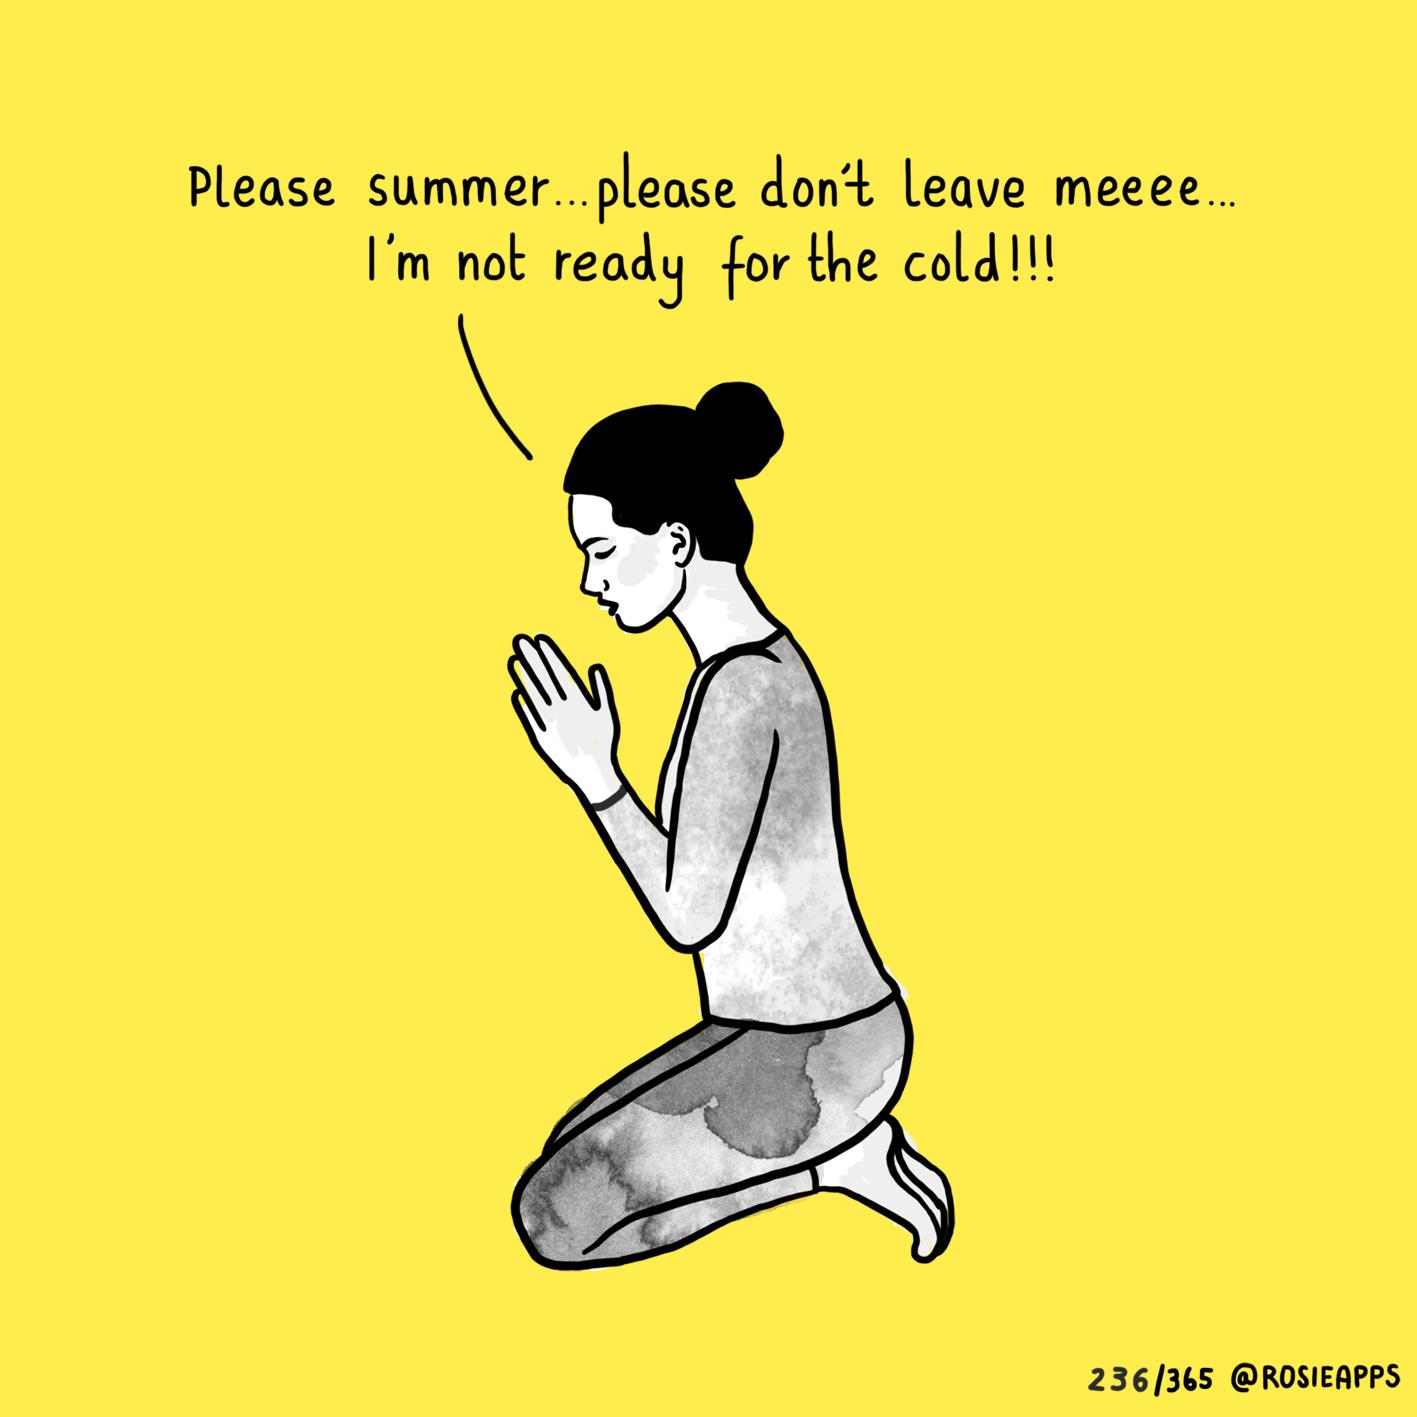 August-236-365 please summer.jpg